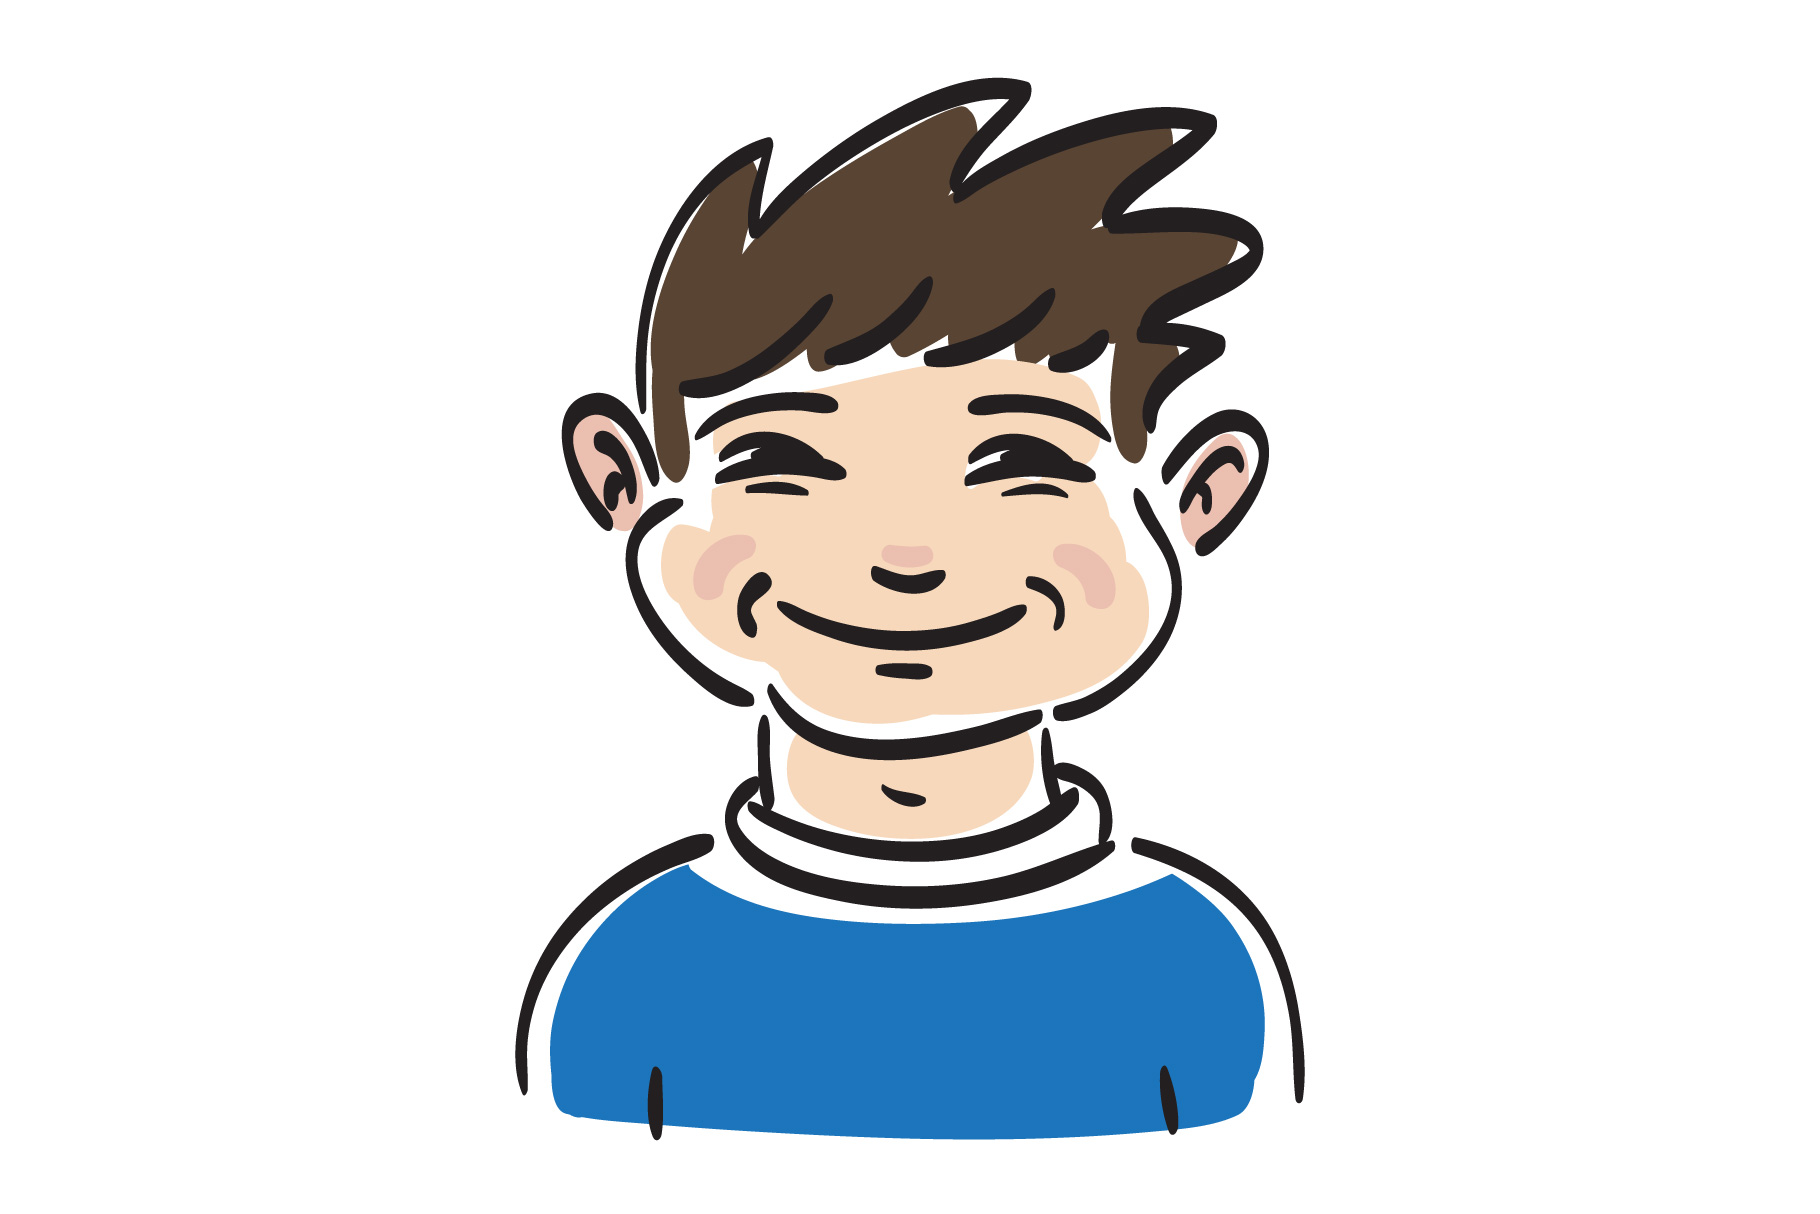 Happy boy face. Cute smile boy. Hand drawn illustrtion. example image 1